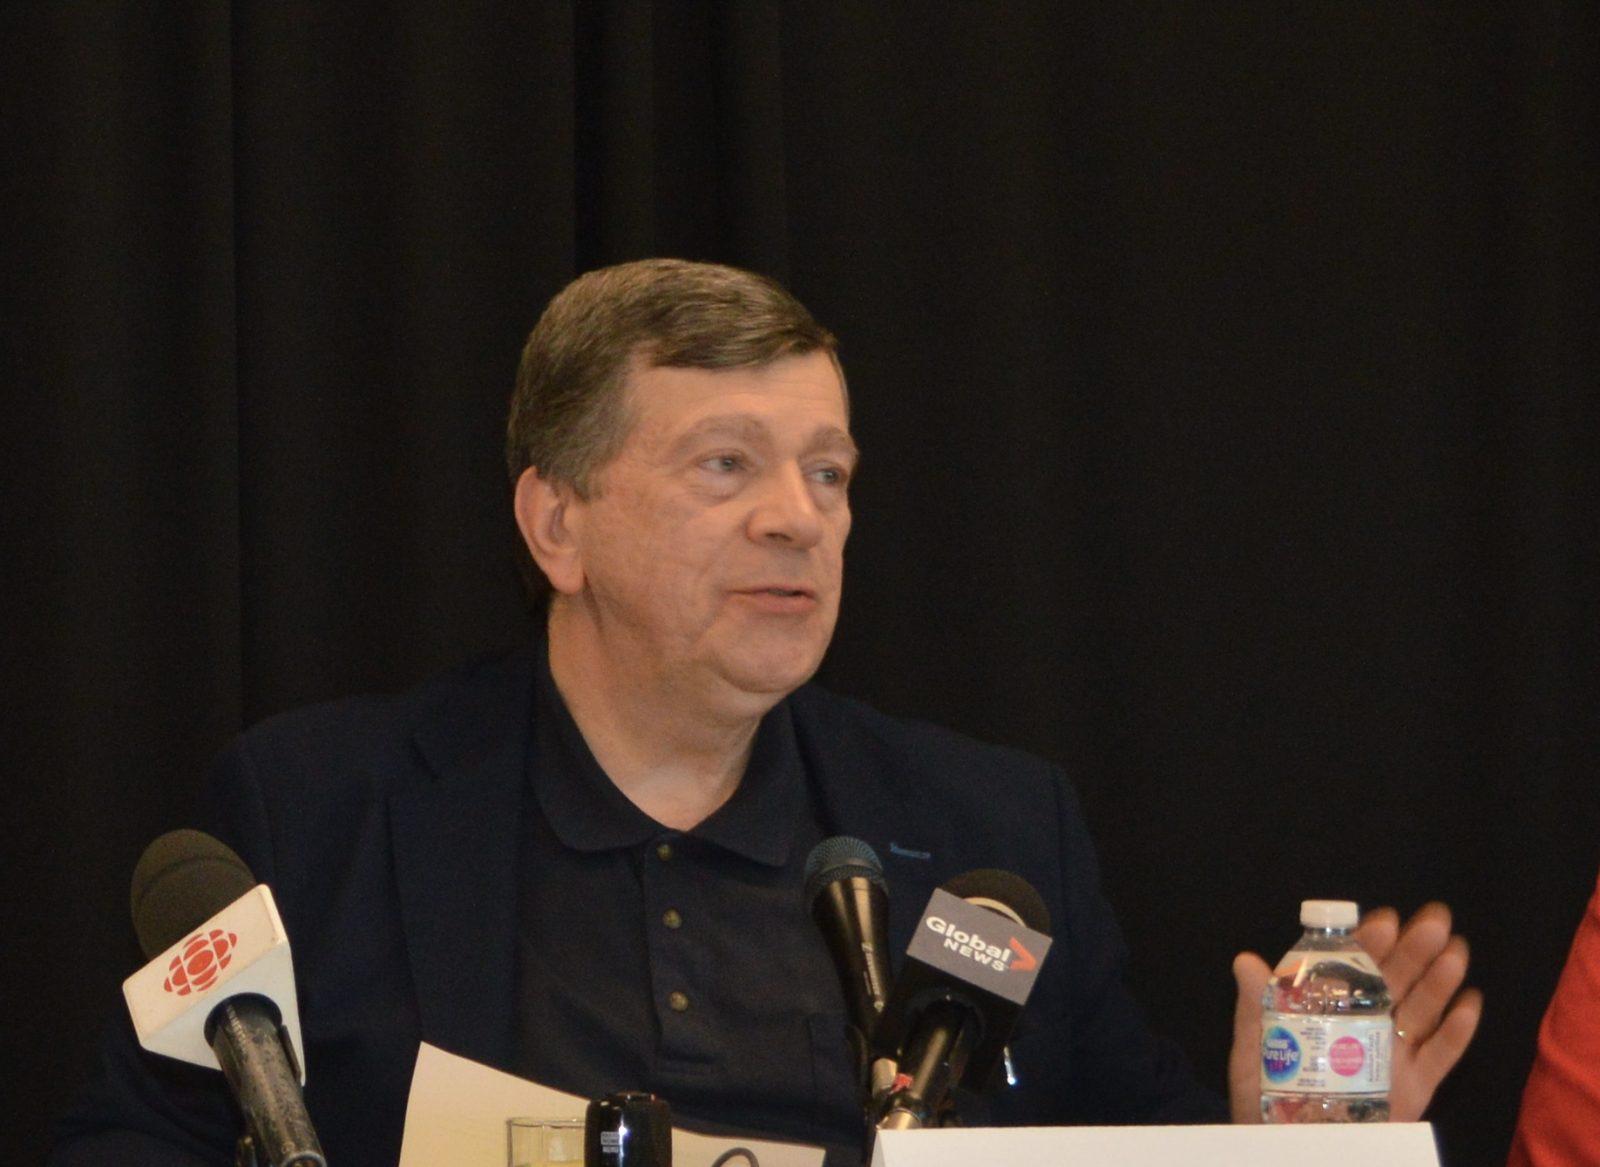 Dr. Paul Roumeliotis updates Cornwall council on quarantine